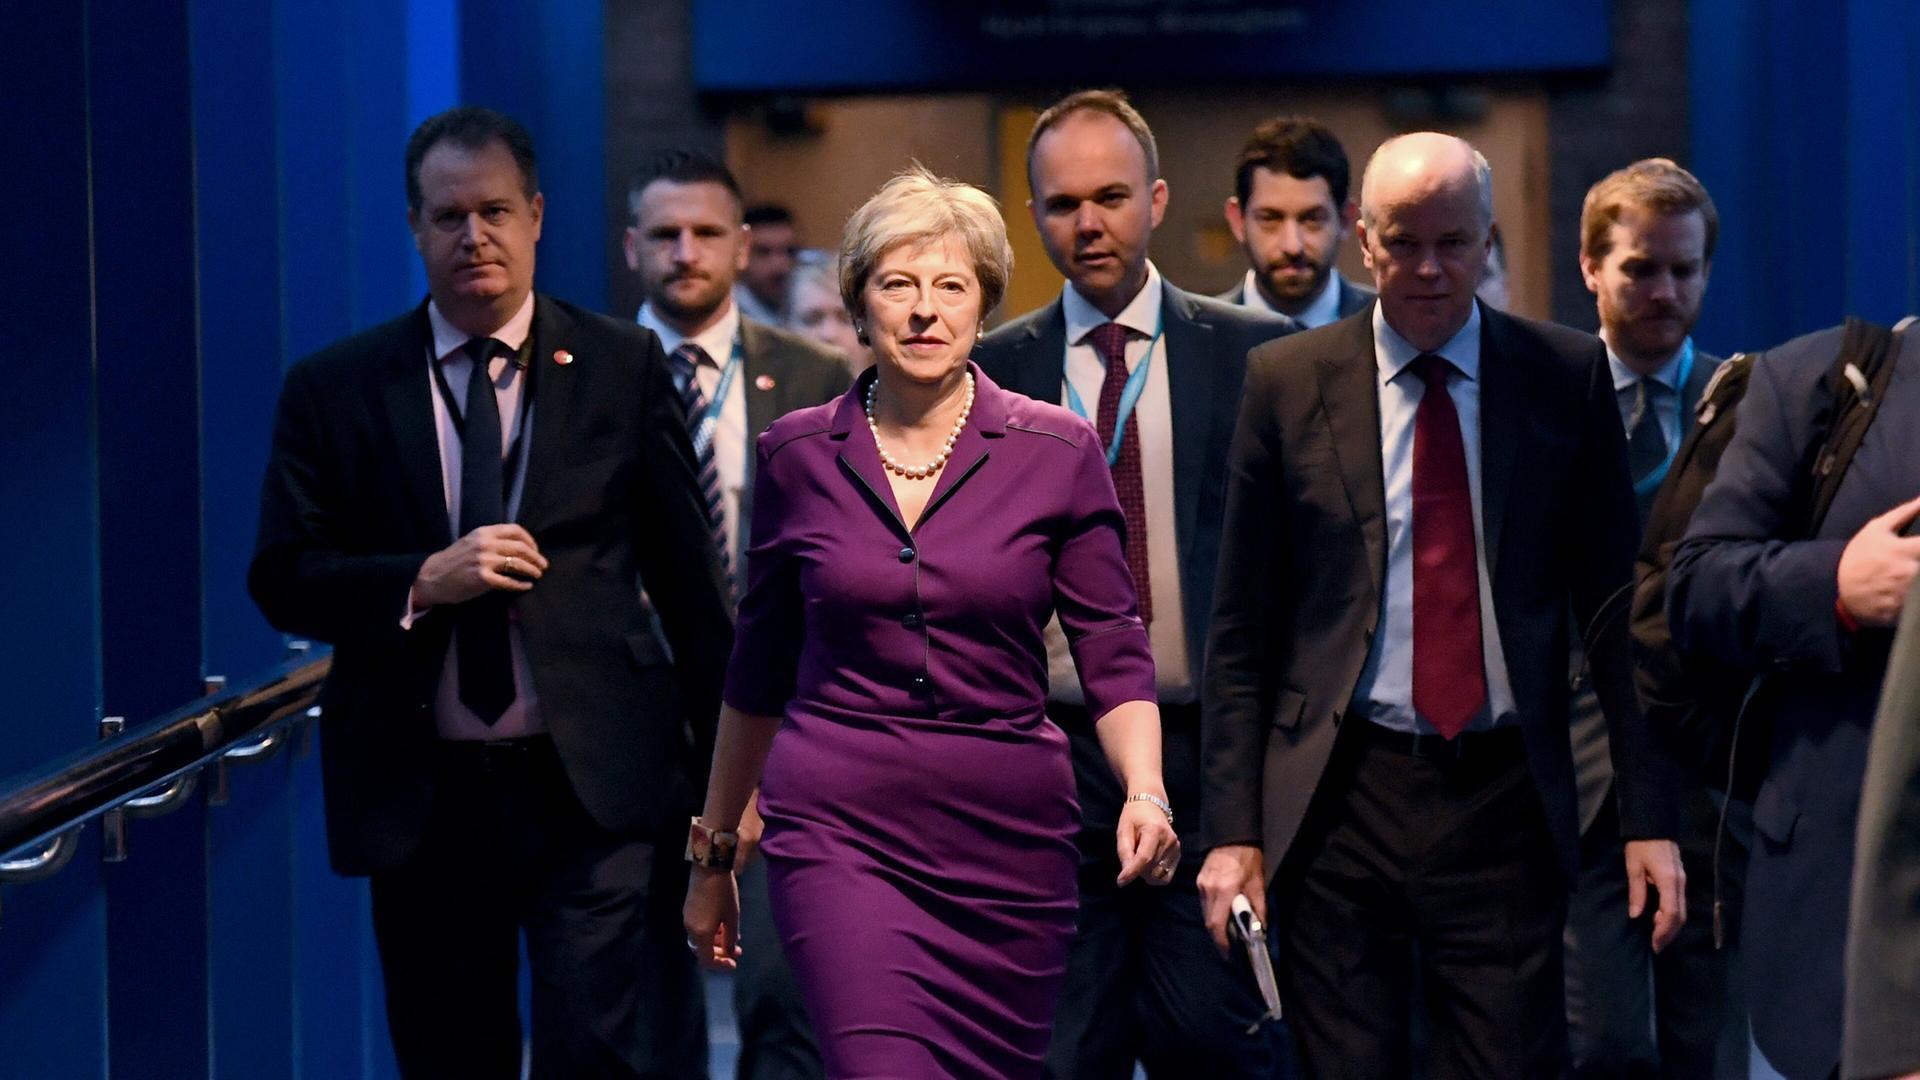 theresa may conservatives - Christian Sievers Lebenslauf